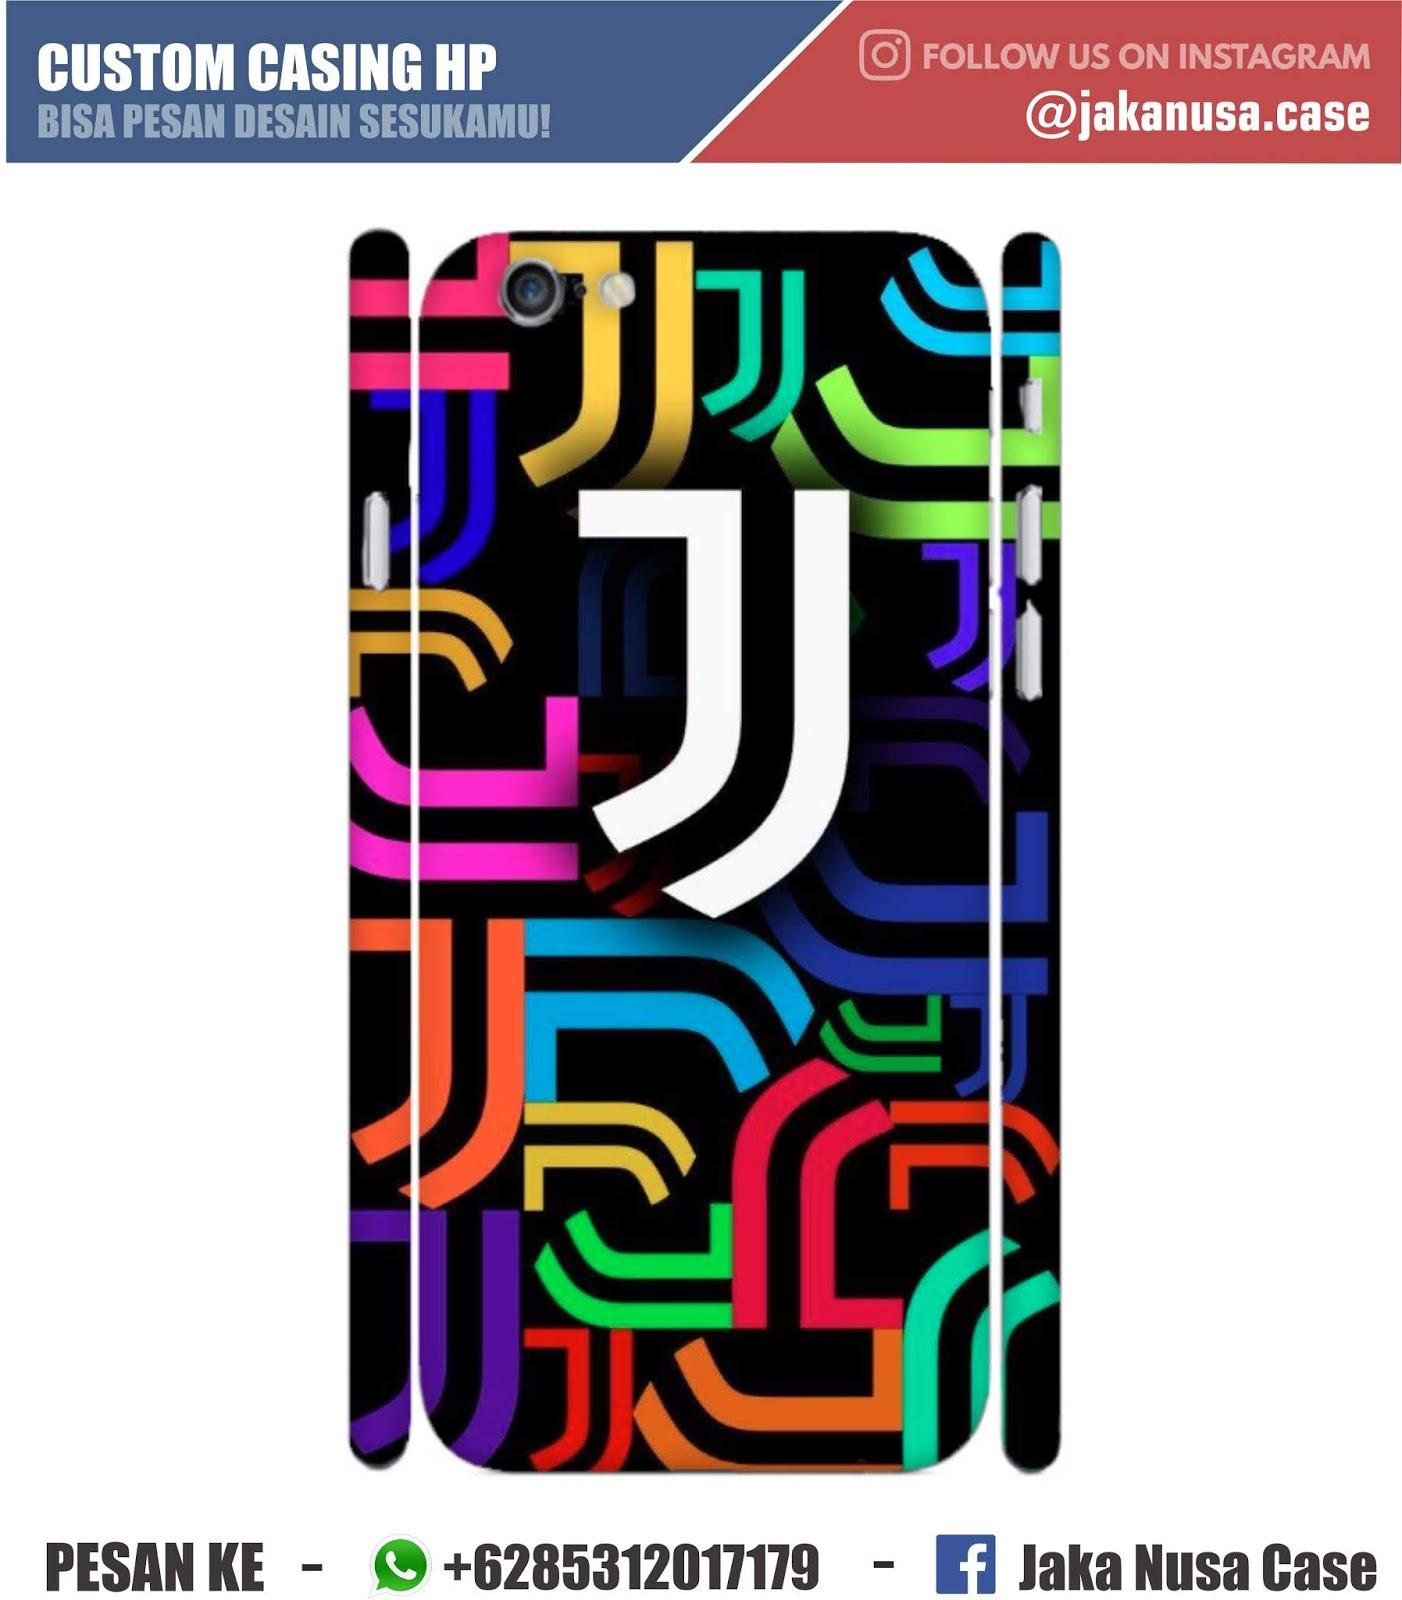 Jasa Desain Wajah: Casing HP Gambar Logo Juventus Terbaru 2019/2020 Harga Ter